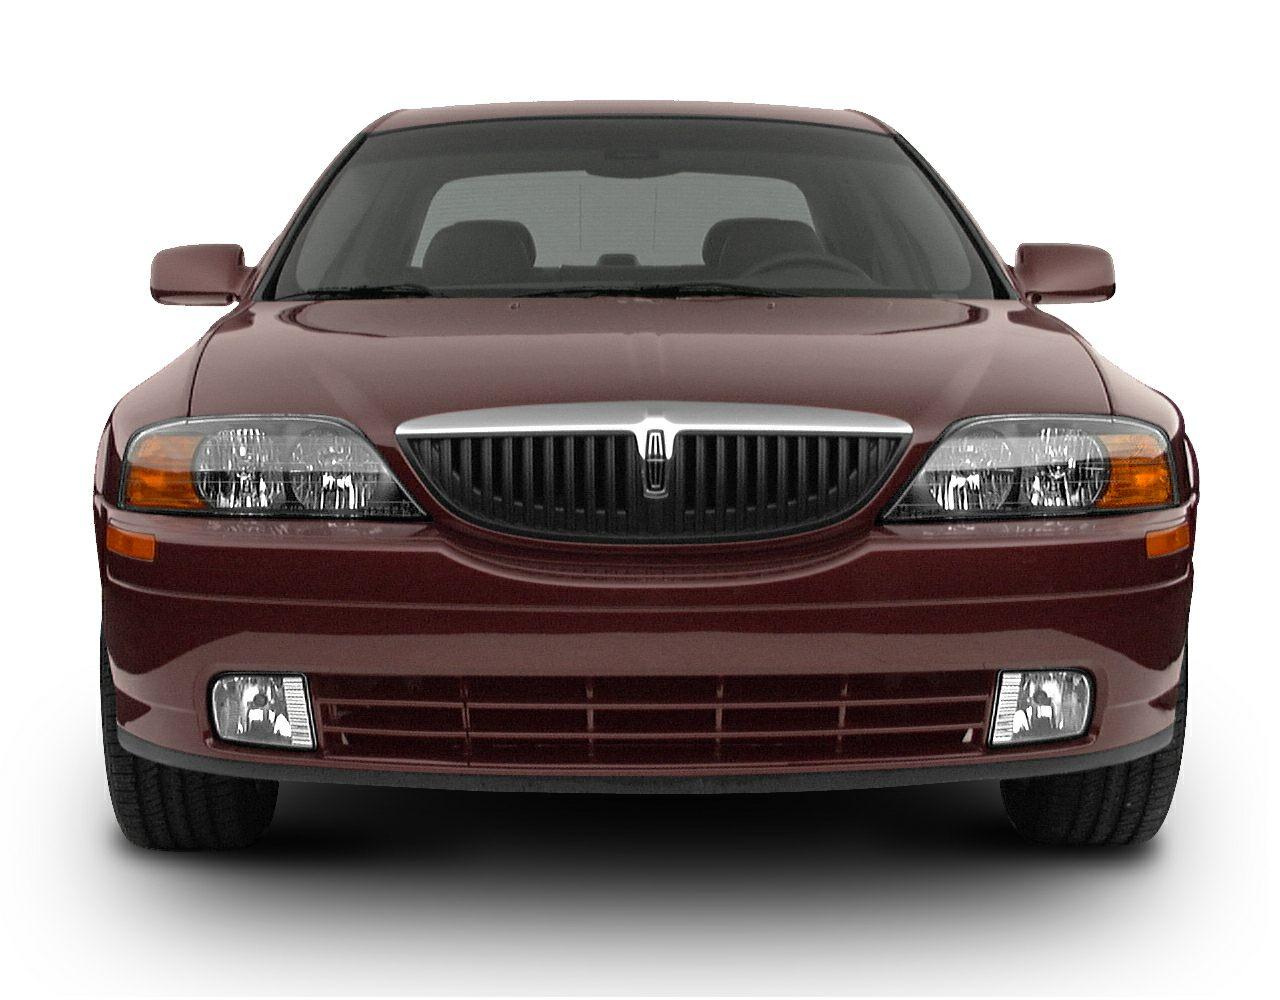 2000 Lincoln LS Exterior Photo